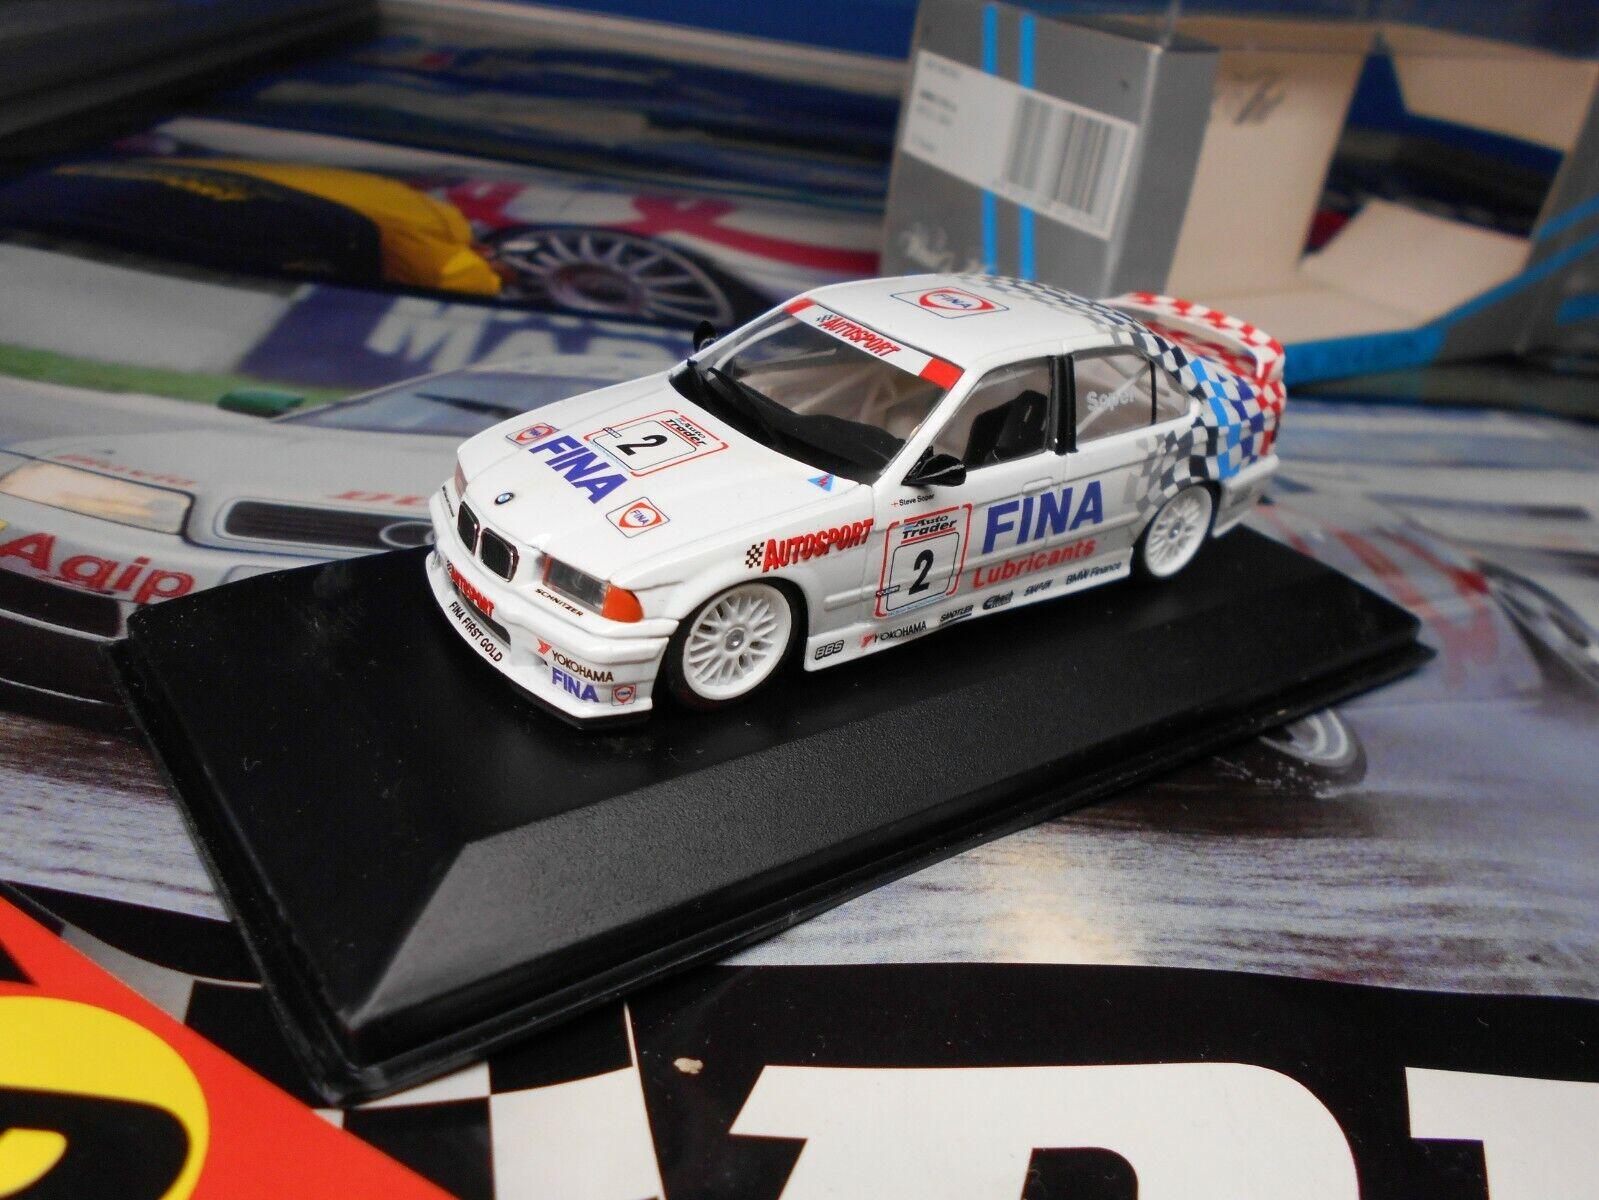 1 43 MINICHAMPS BMW 318 IS BTCC 1994 FINA TOURISME TOURISMO